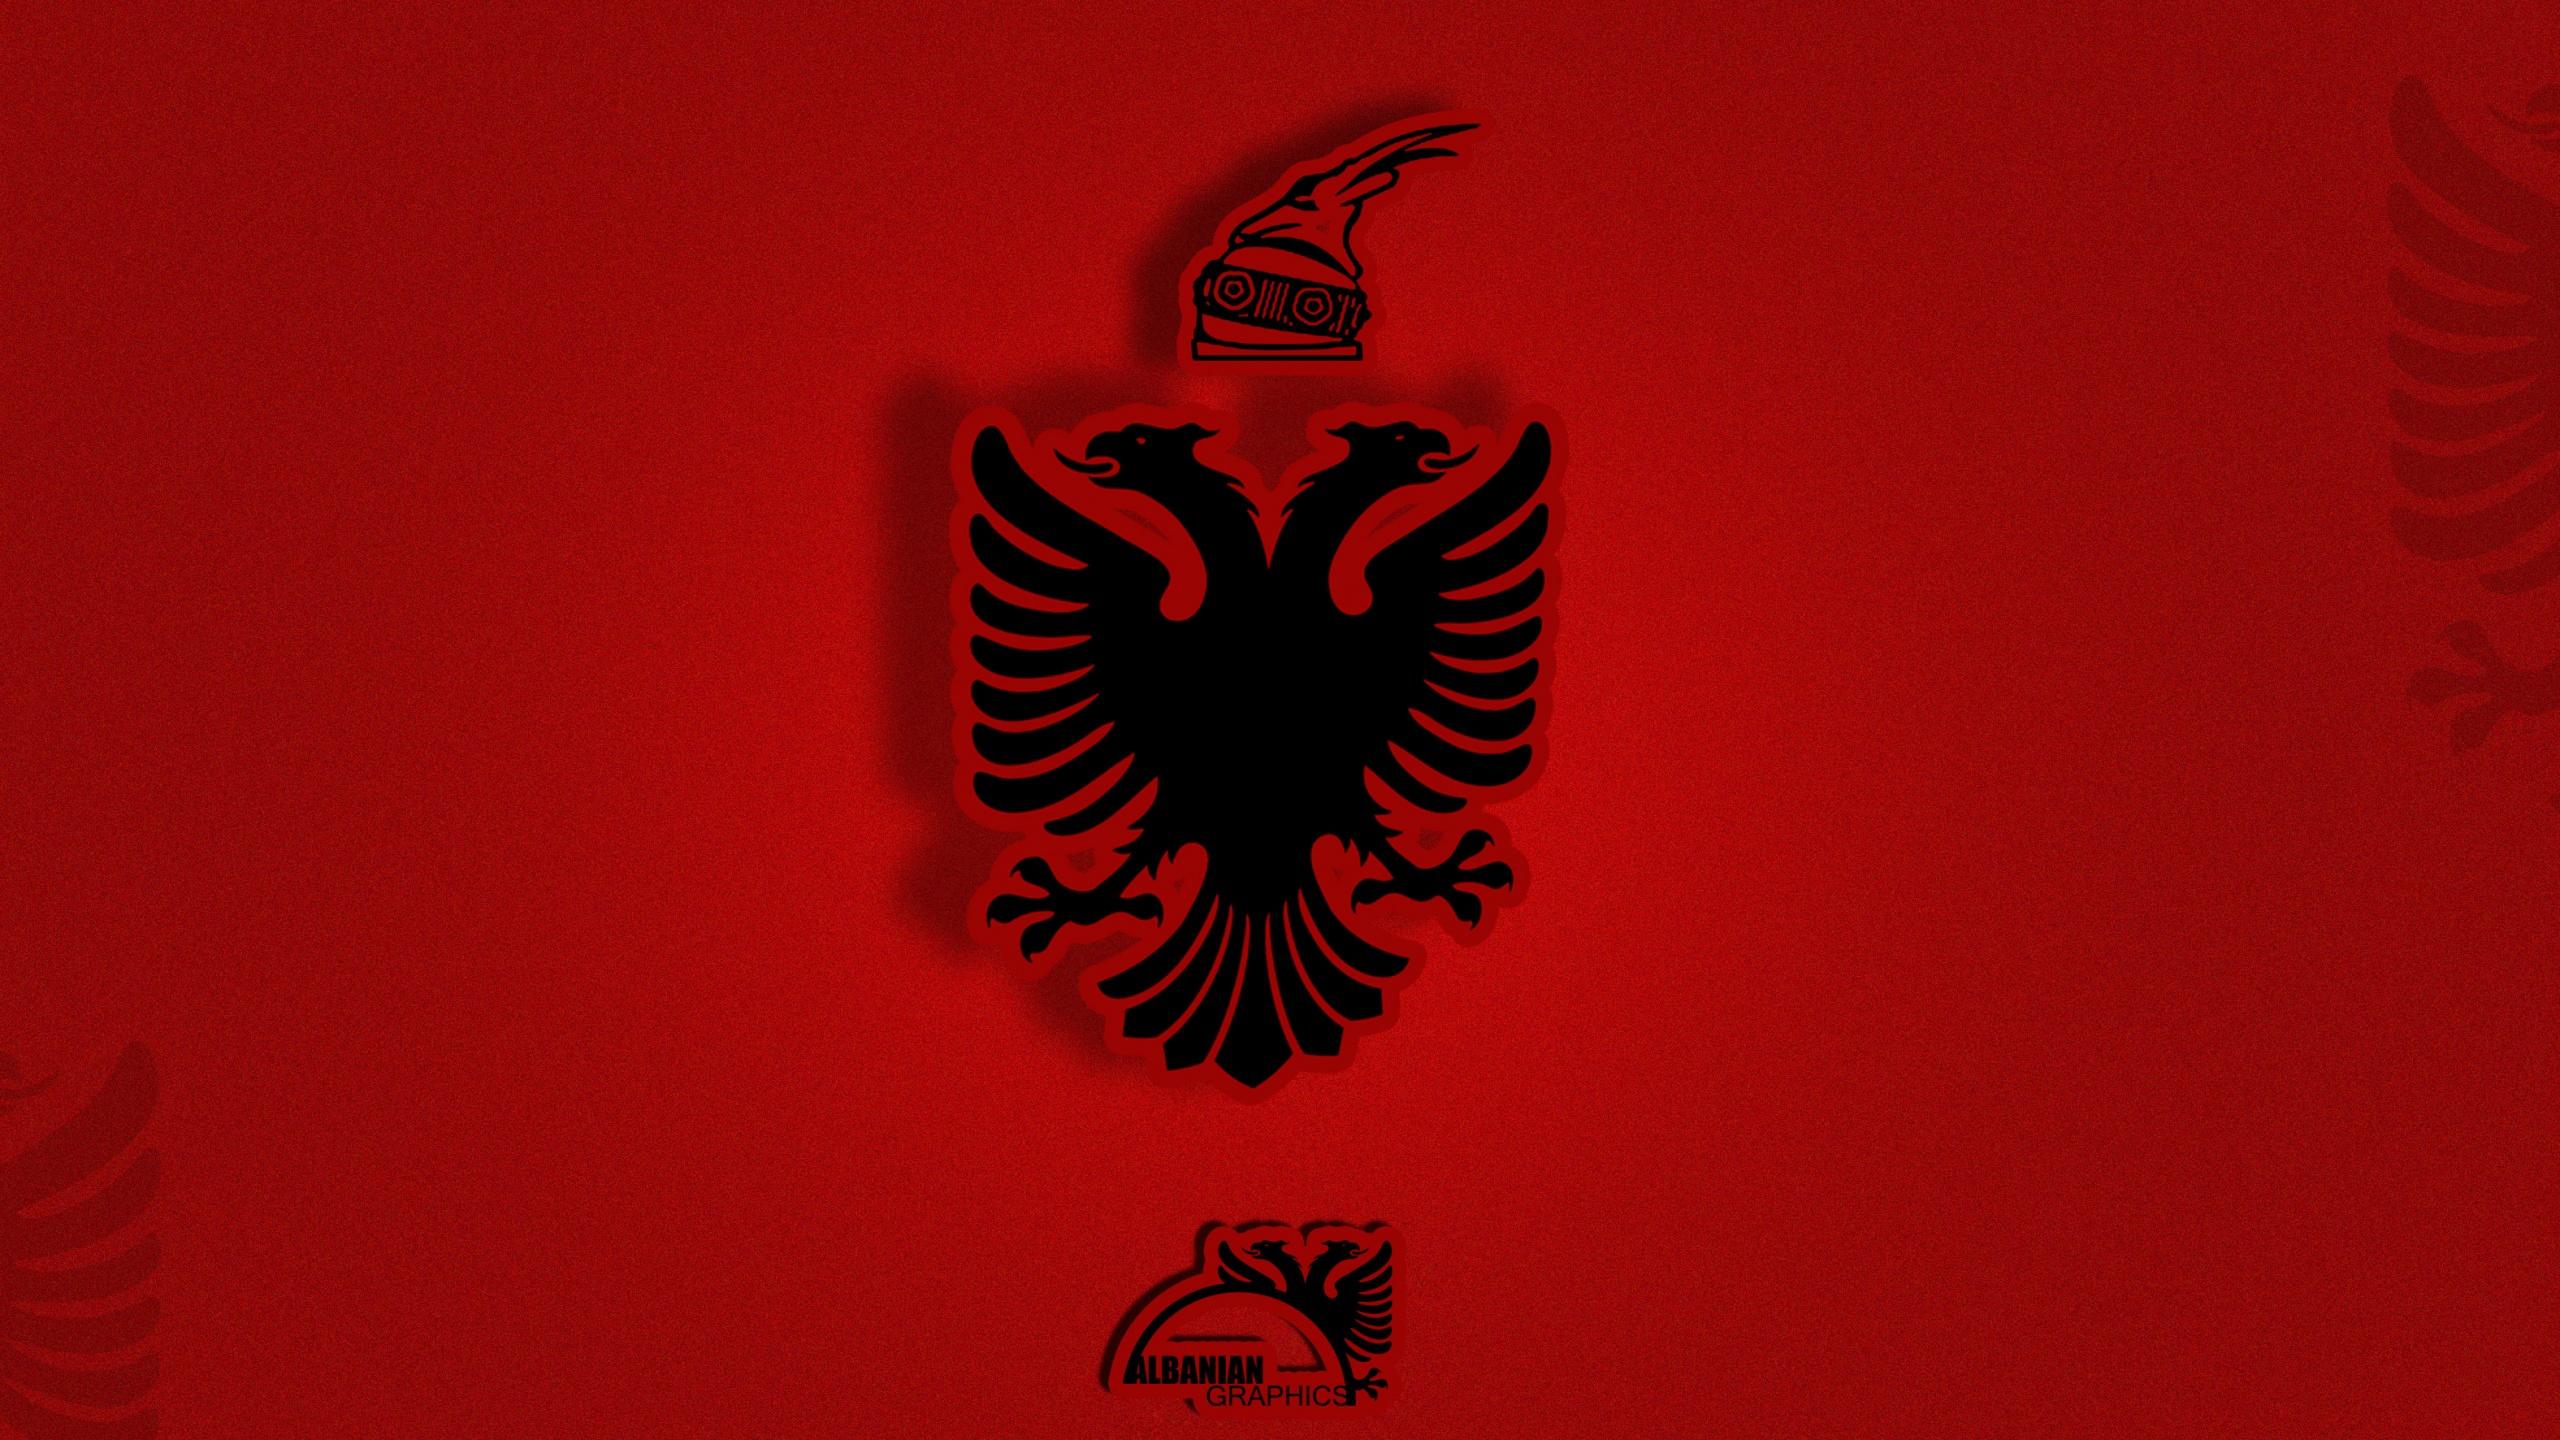 Wallpaper albanien Best 36+